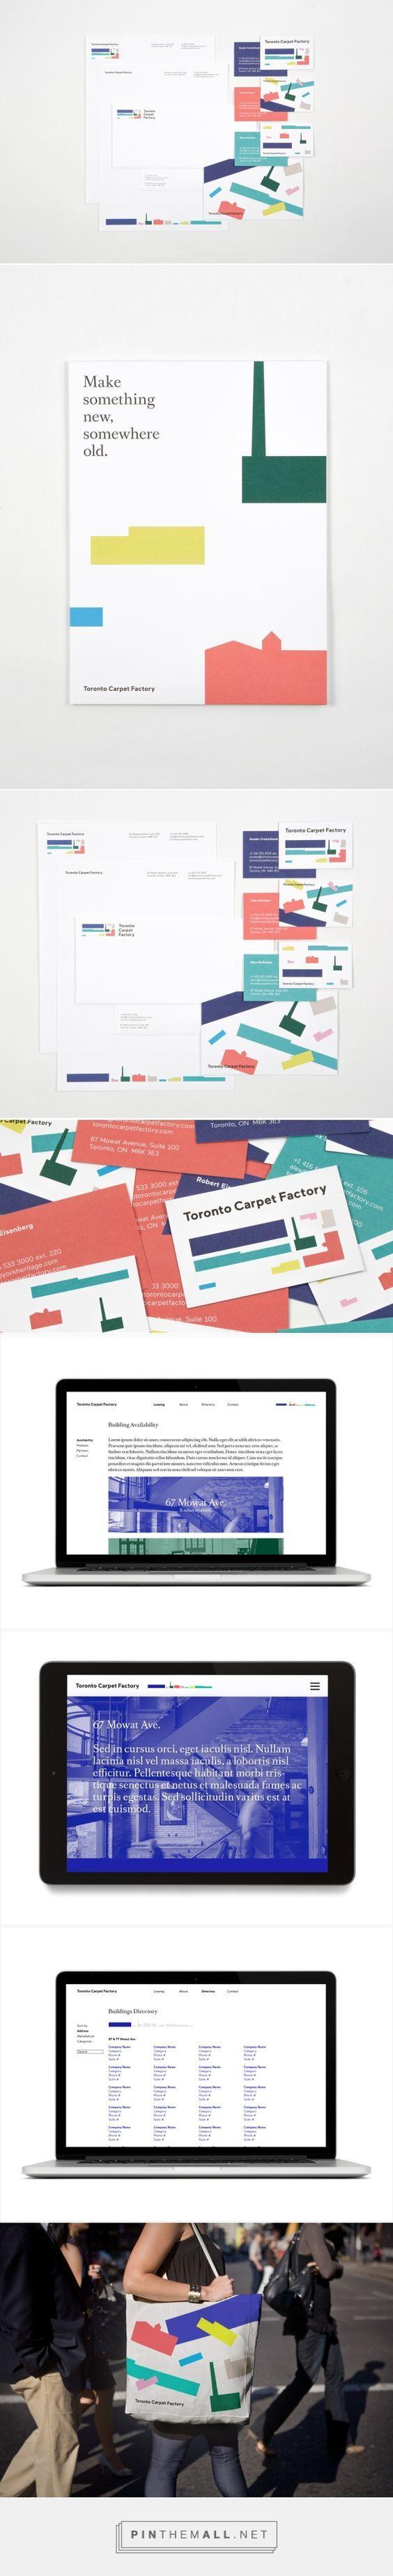 Toronto Carpet Factory  Branding by Bruce Mau Design | Fivestar Branding – Design and Branding Agency & Inspiration Gallery